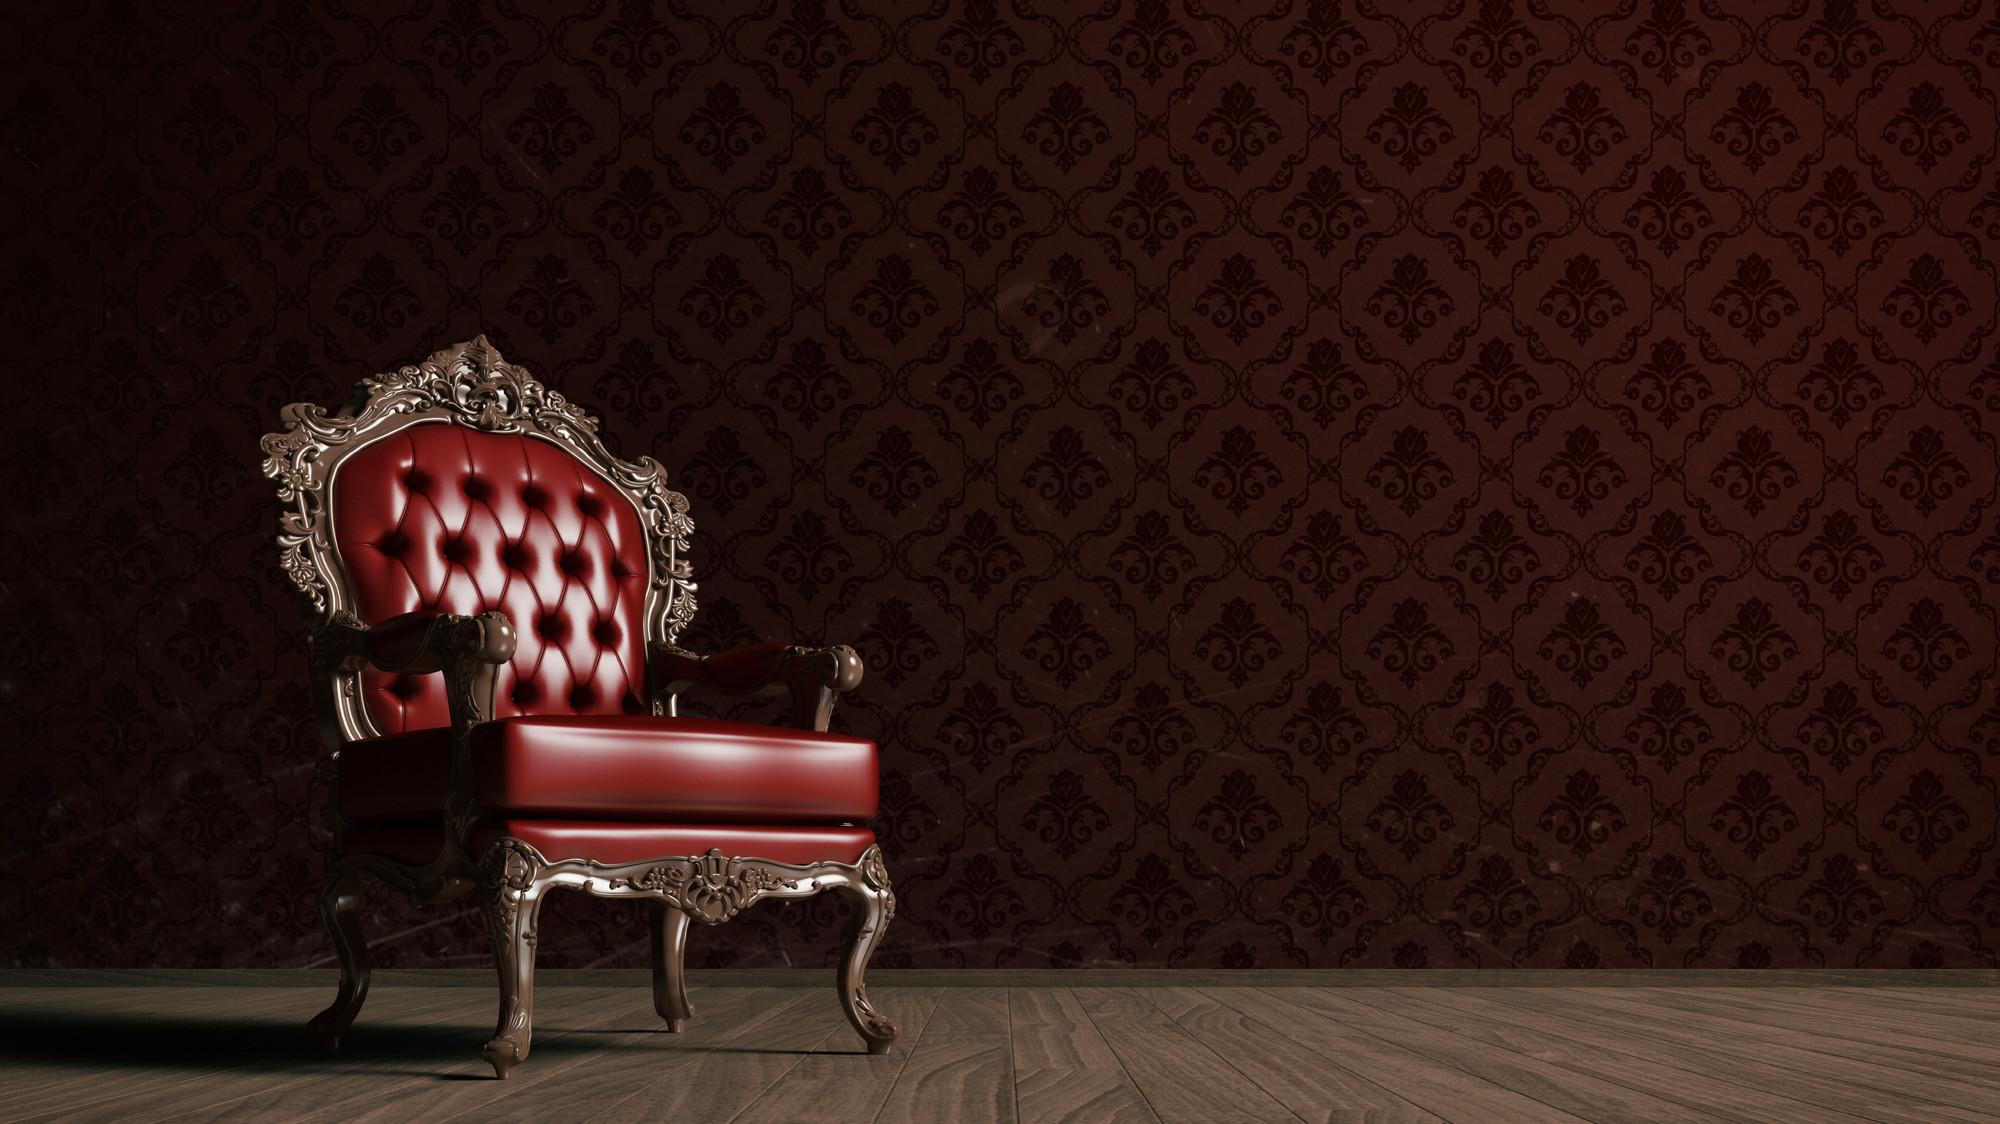 bea hei klebepistole hei kleber kleema polstereibedarf. Black Bedroom Furniture Sets. Home Design Ideas